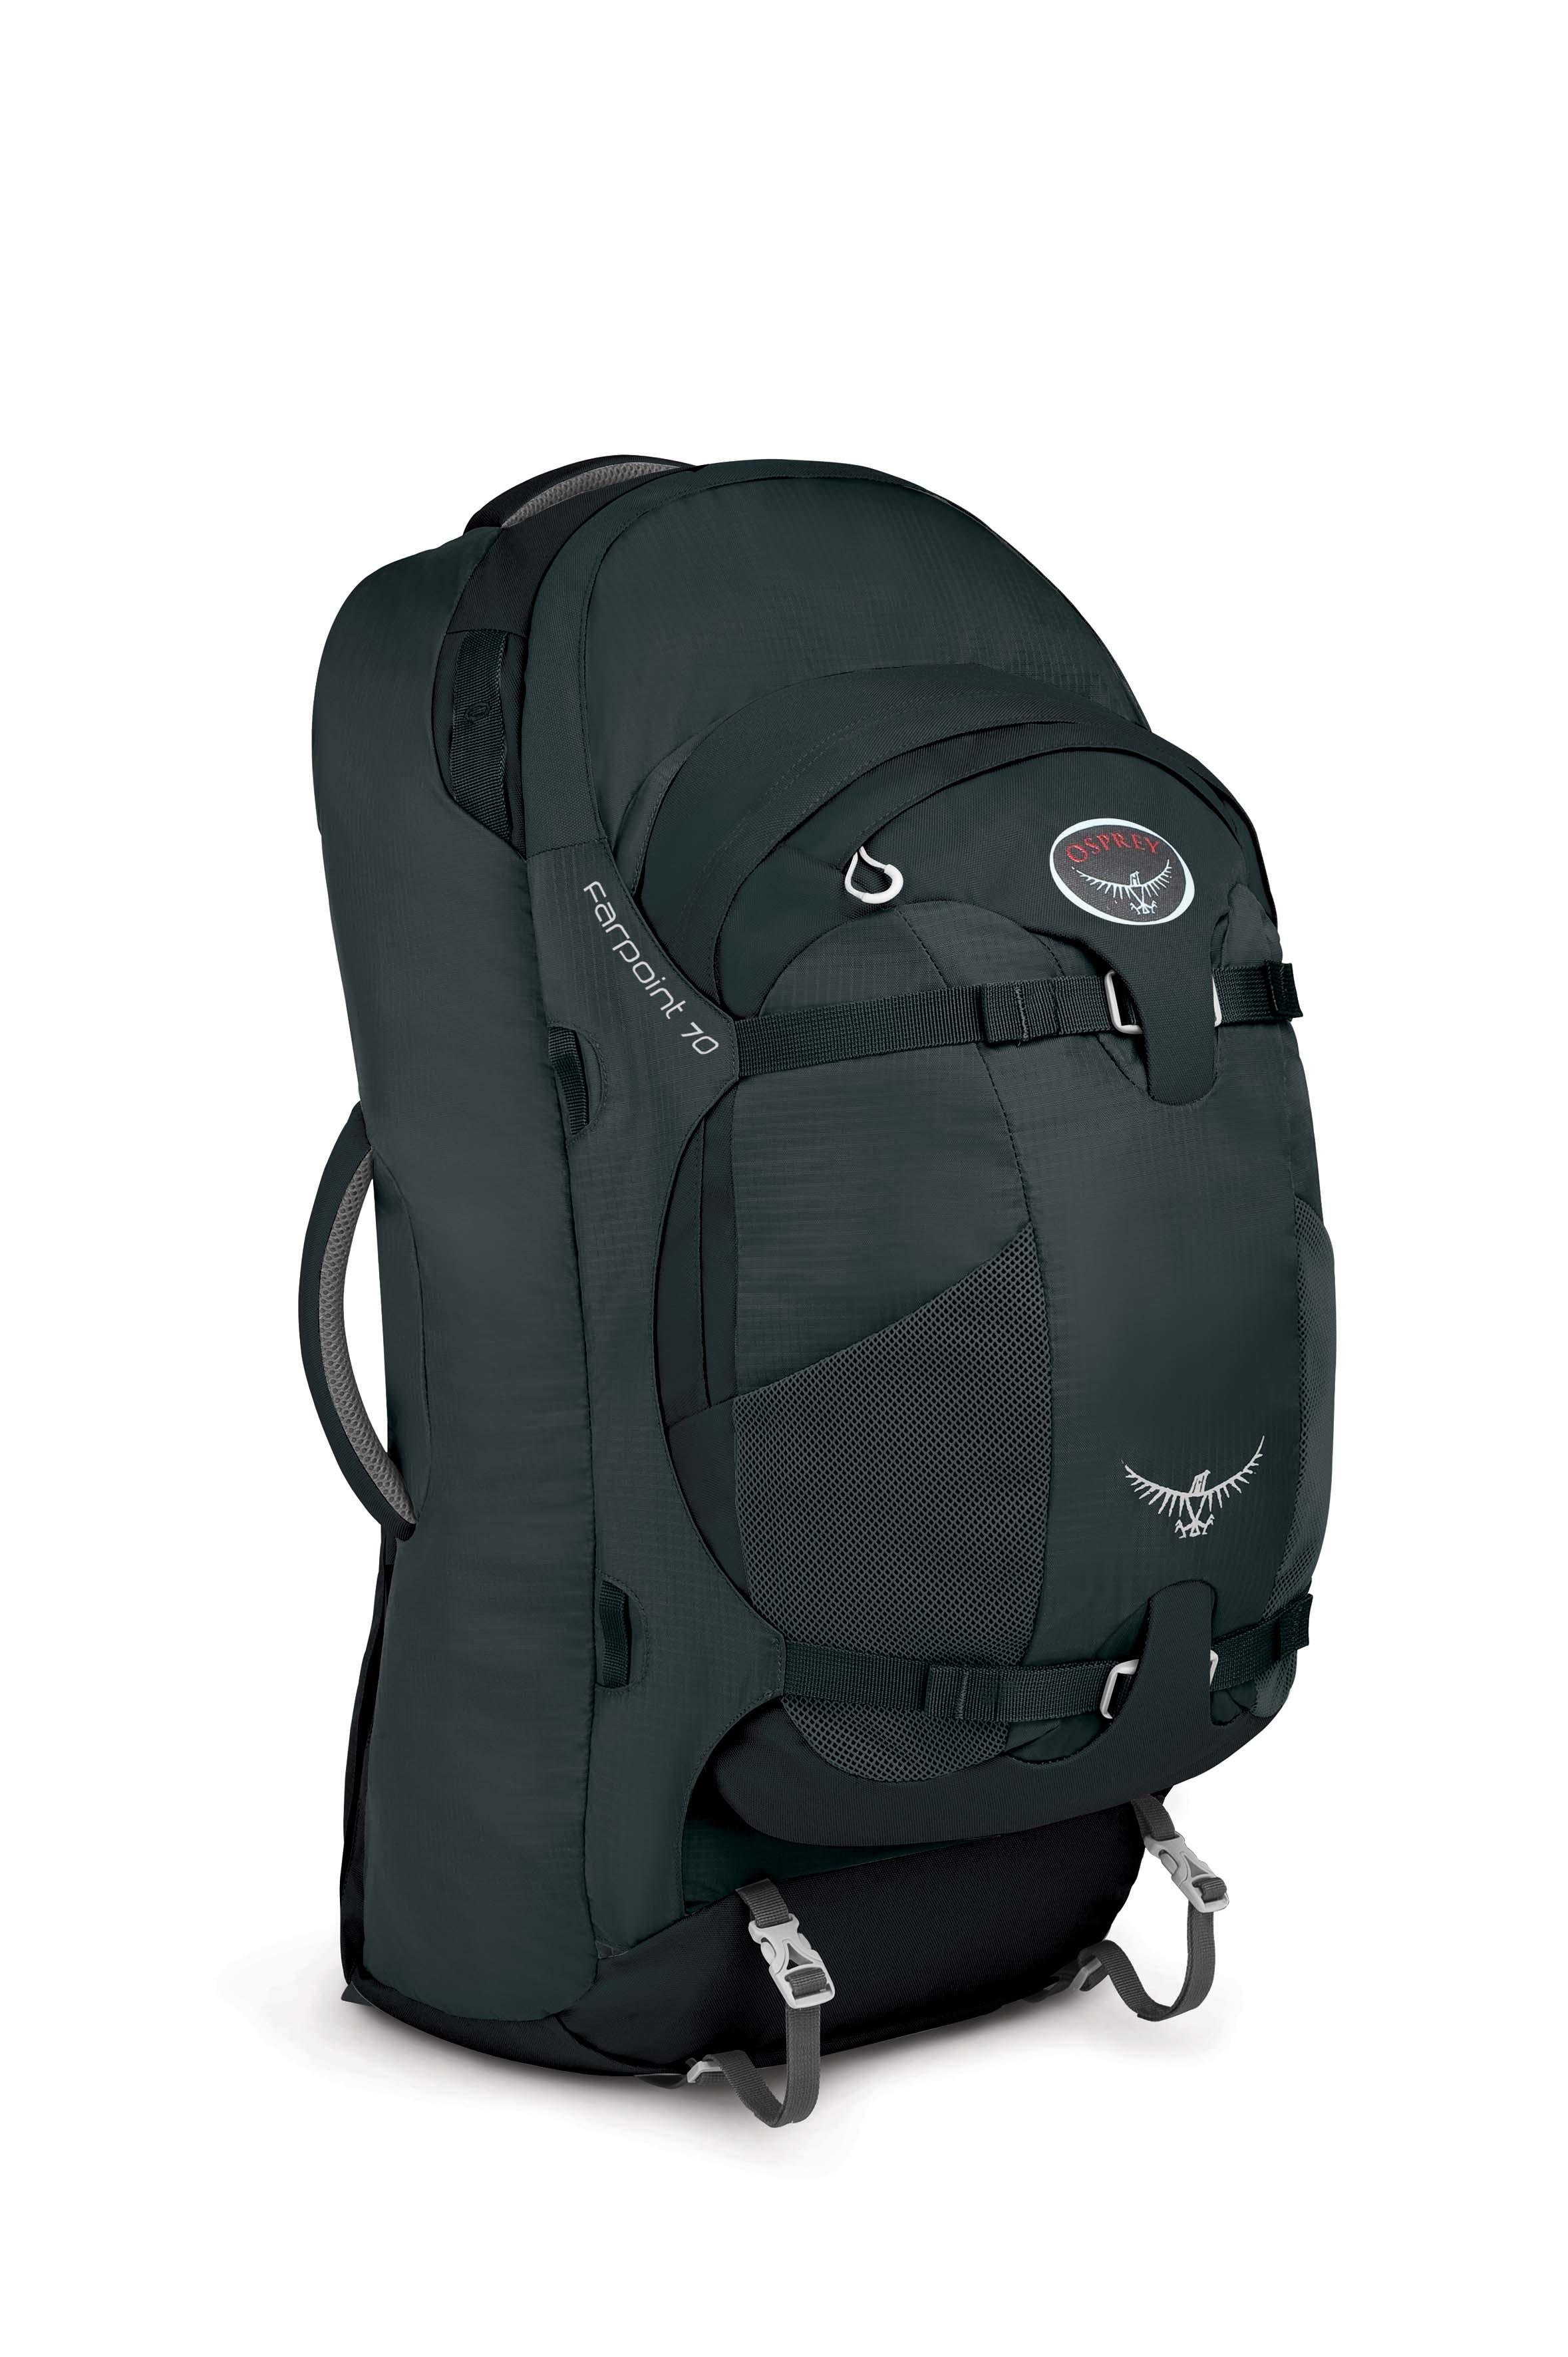 Osprey Farpoint 70 Slate/Charcoal-30